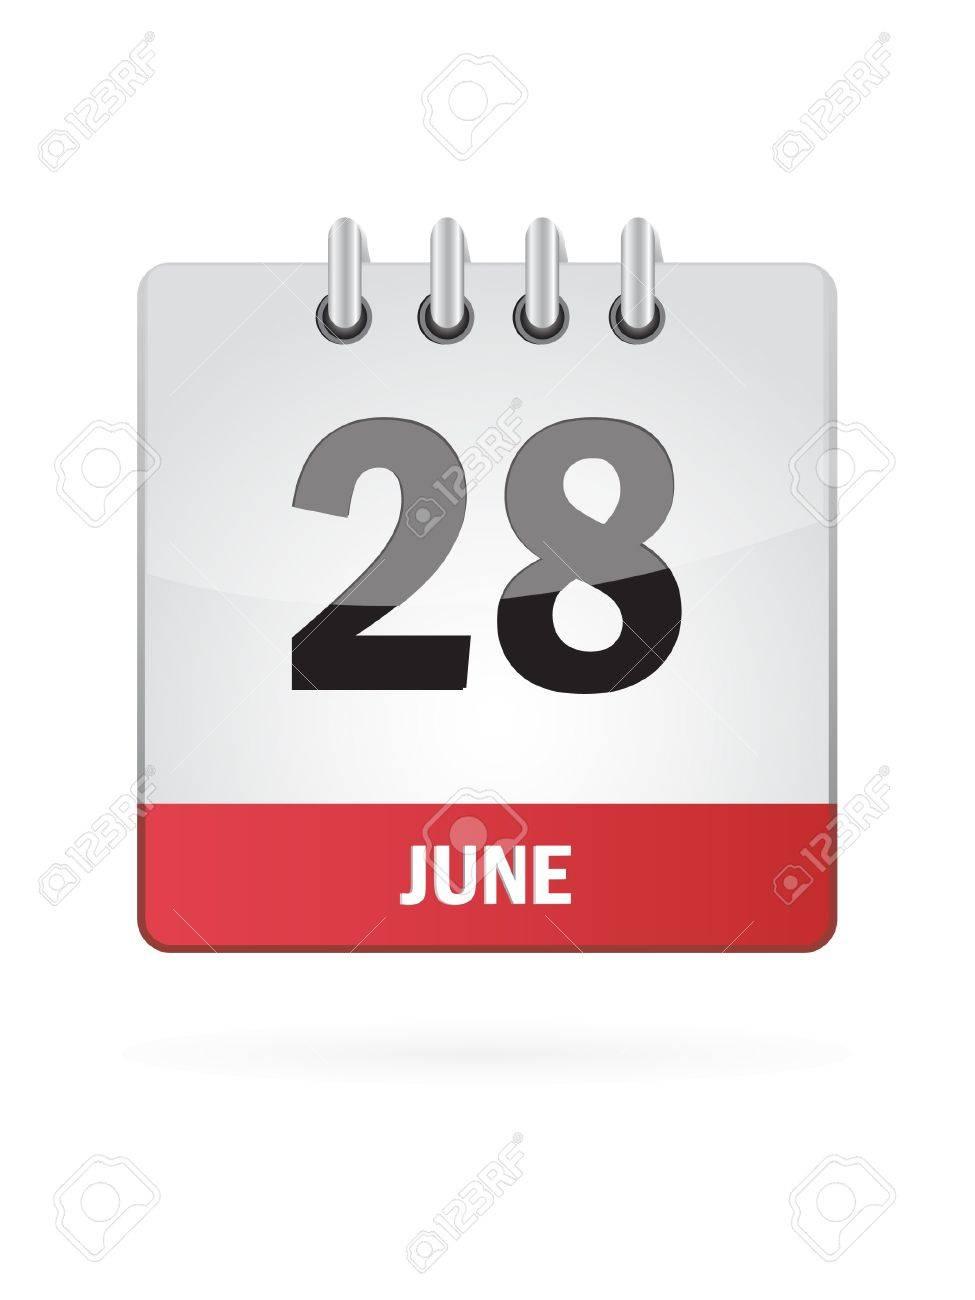 28 June Calendar Icon On White Background Stock Vector - 18457029